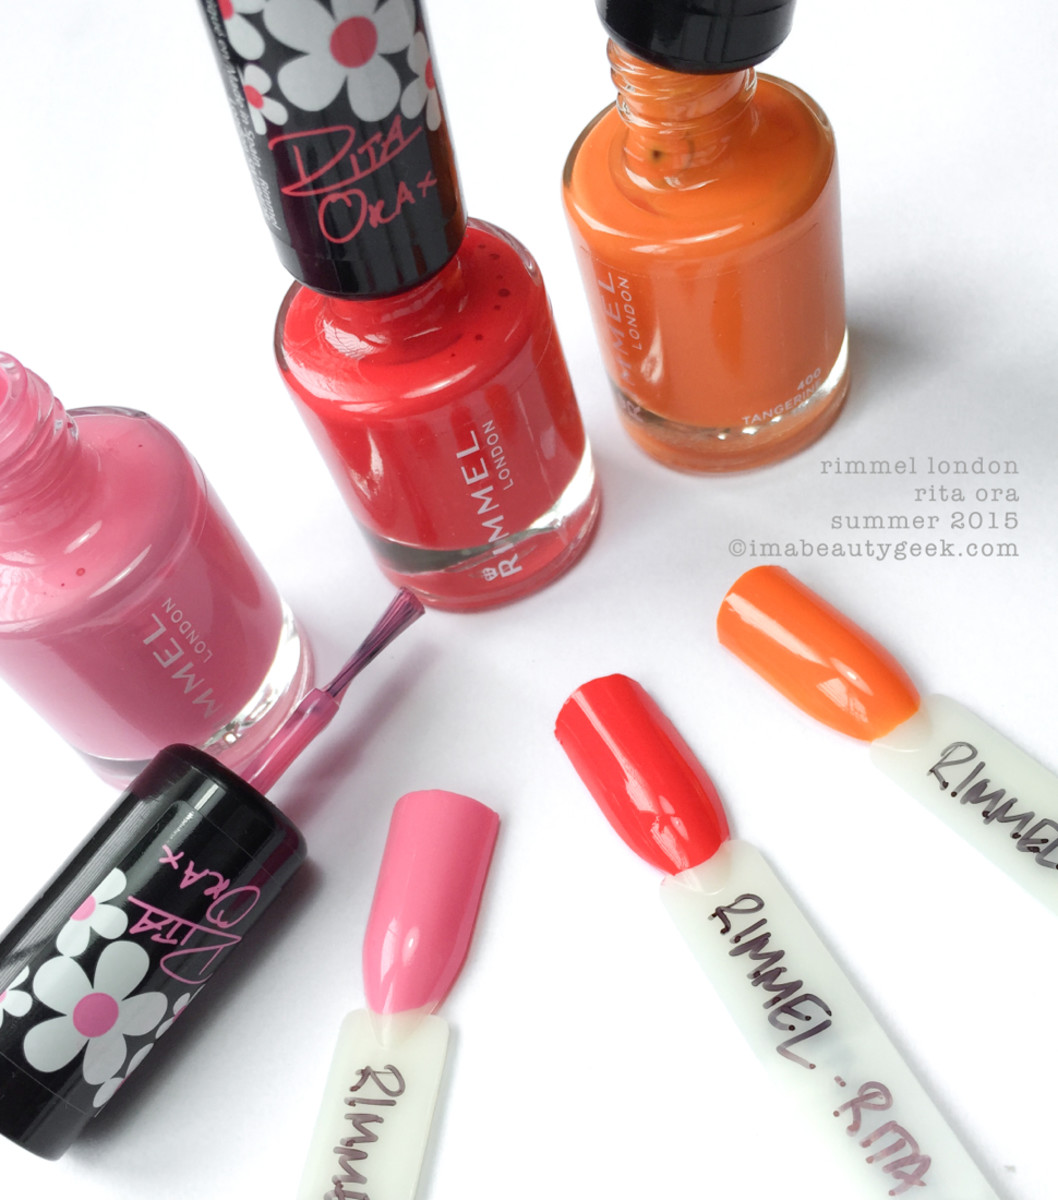 Rimmel Rita Ora Polish Summer 2015 - Beautygeeks